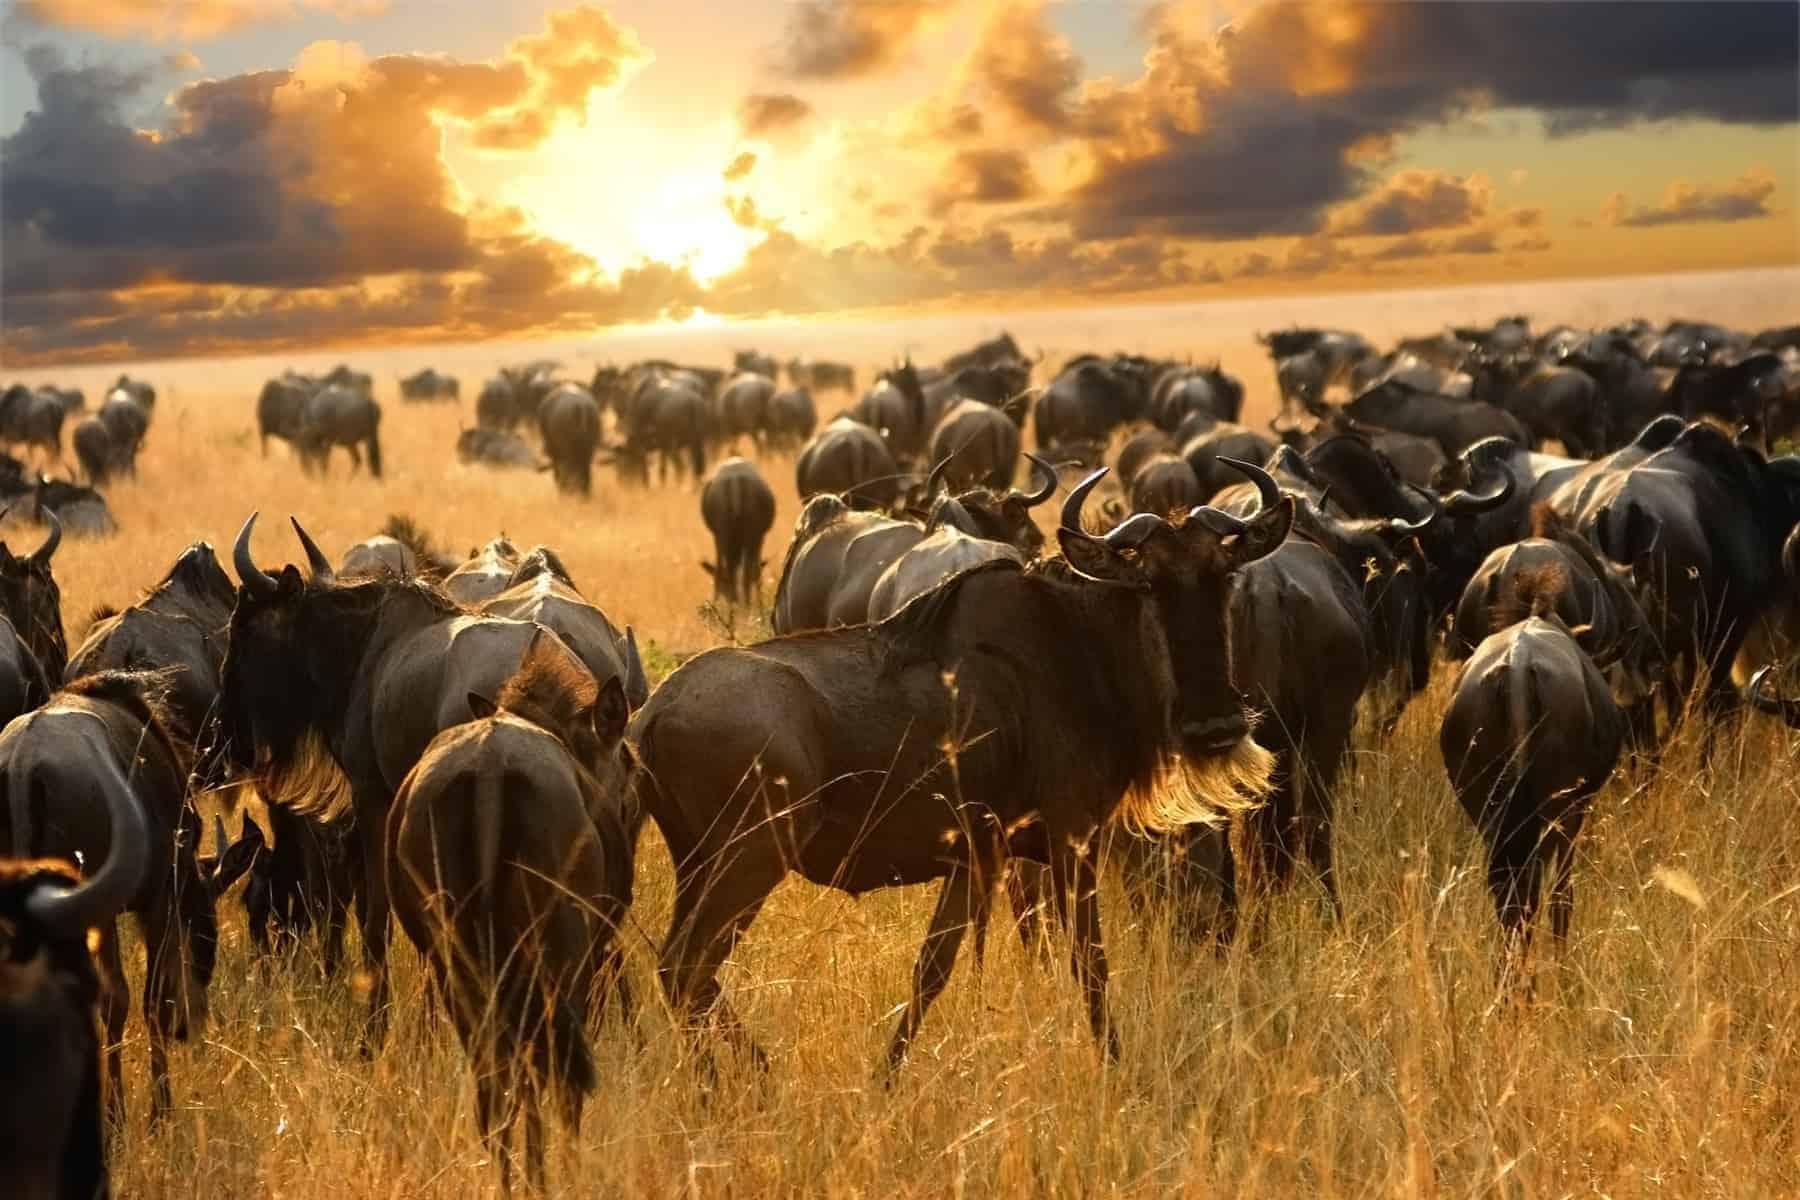 Great migration of antelopes wildebeest in the savannah, Masai Mara, Kenya